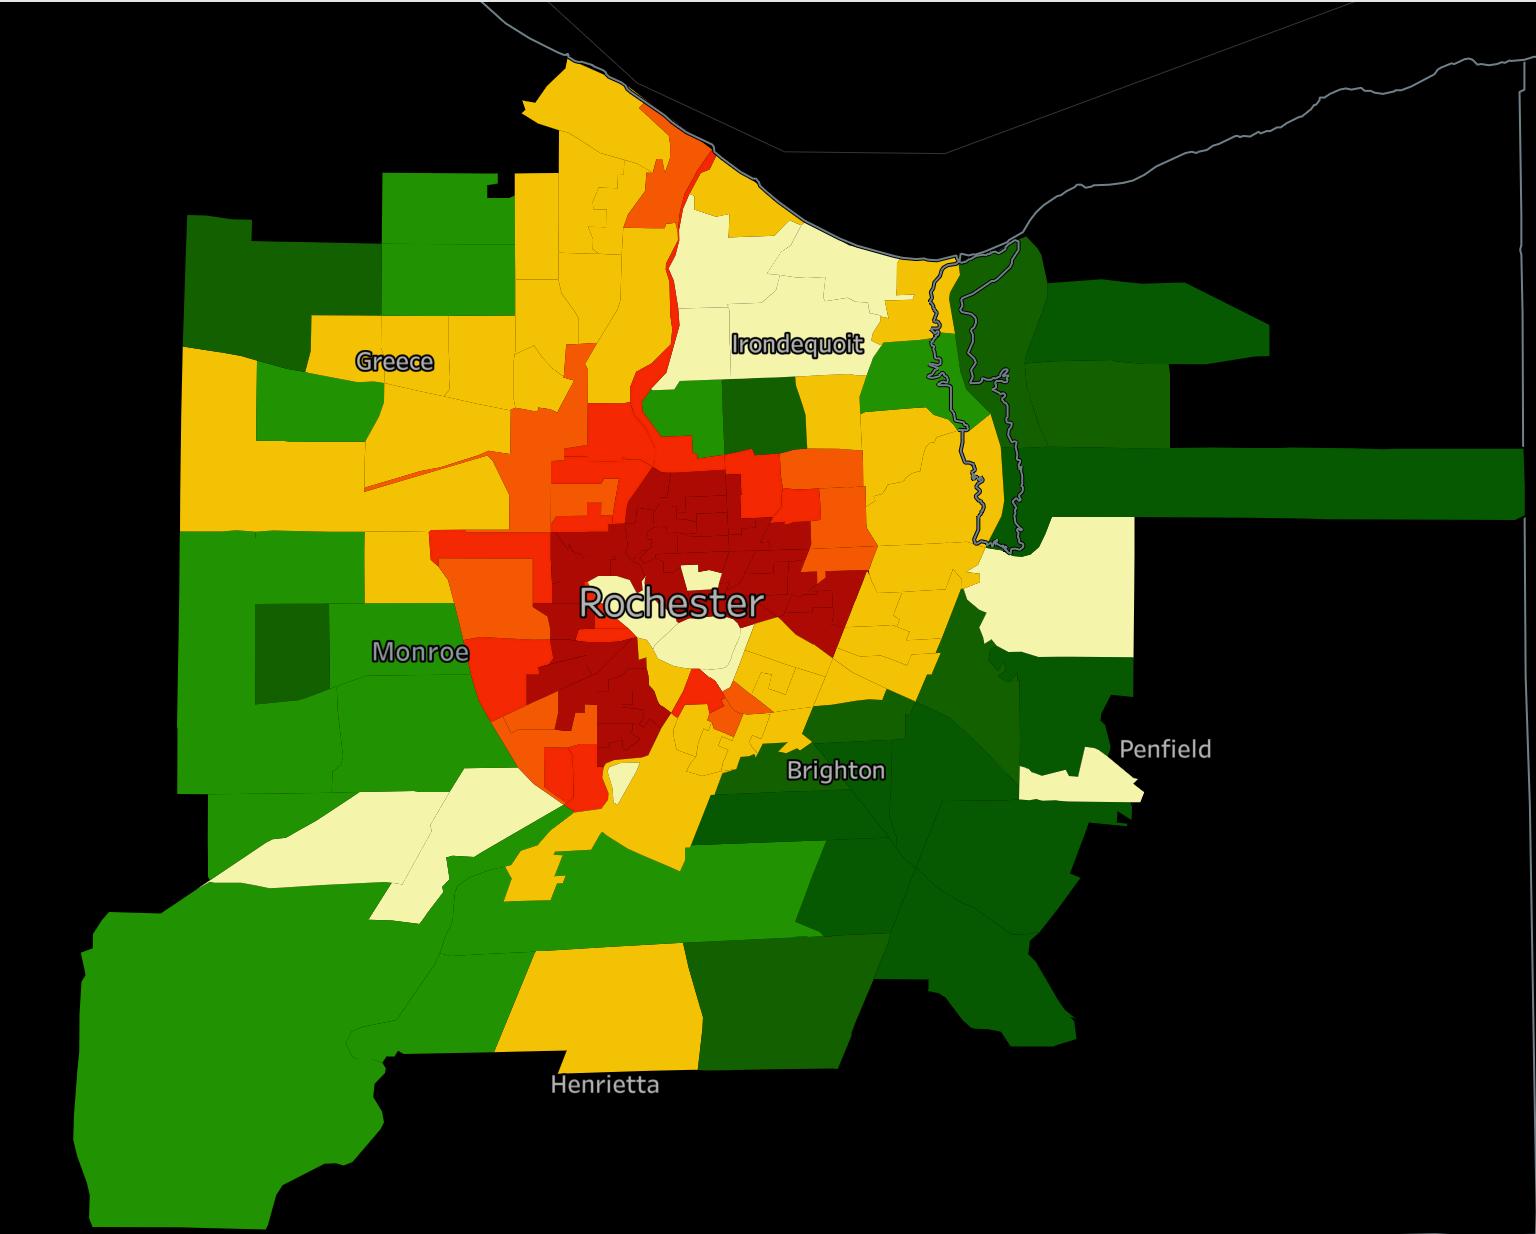 Neighbourhood_Score_Analysis__Census_Tract_Level_NHBD_Score_-_Tableau_Online-1